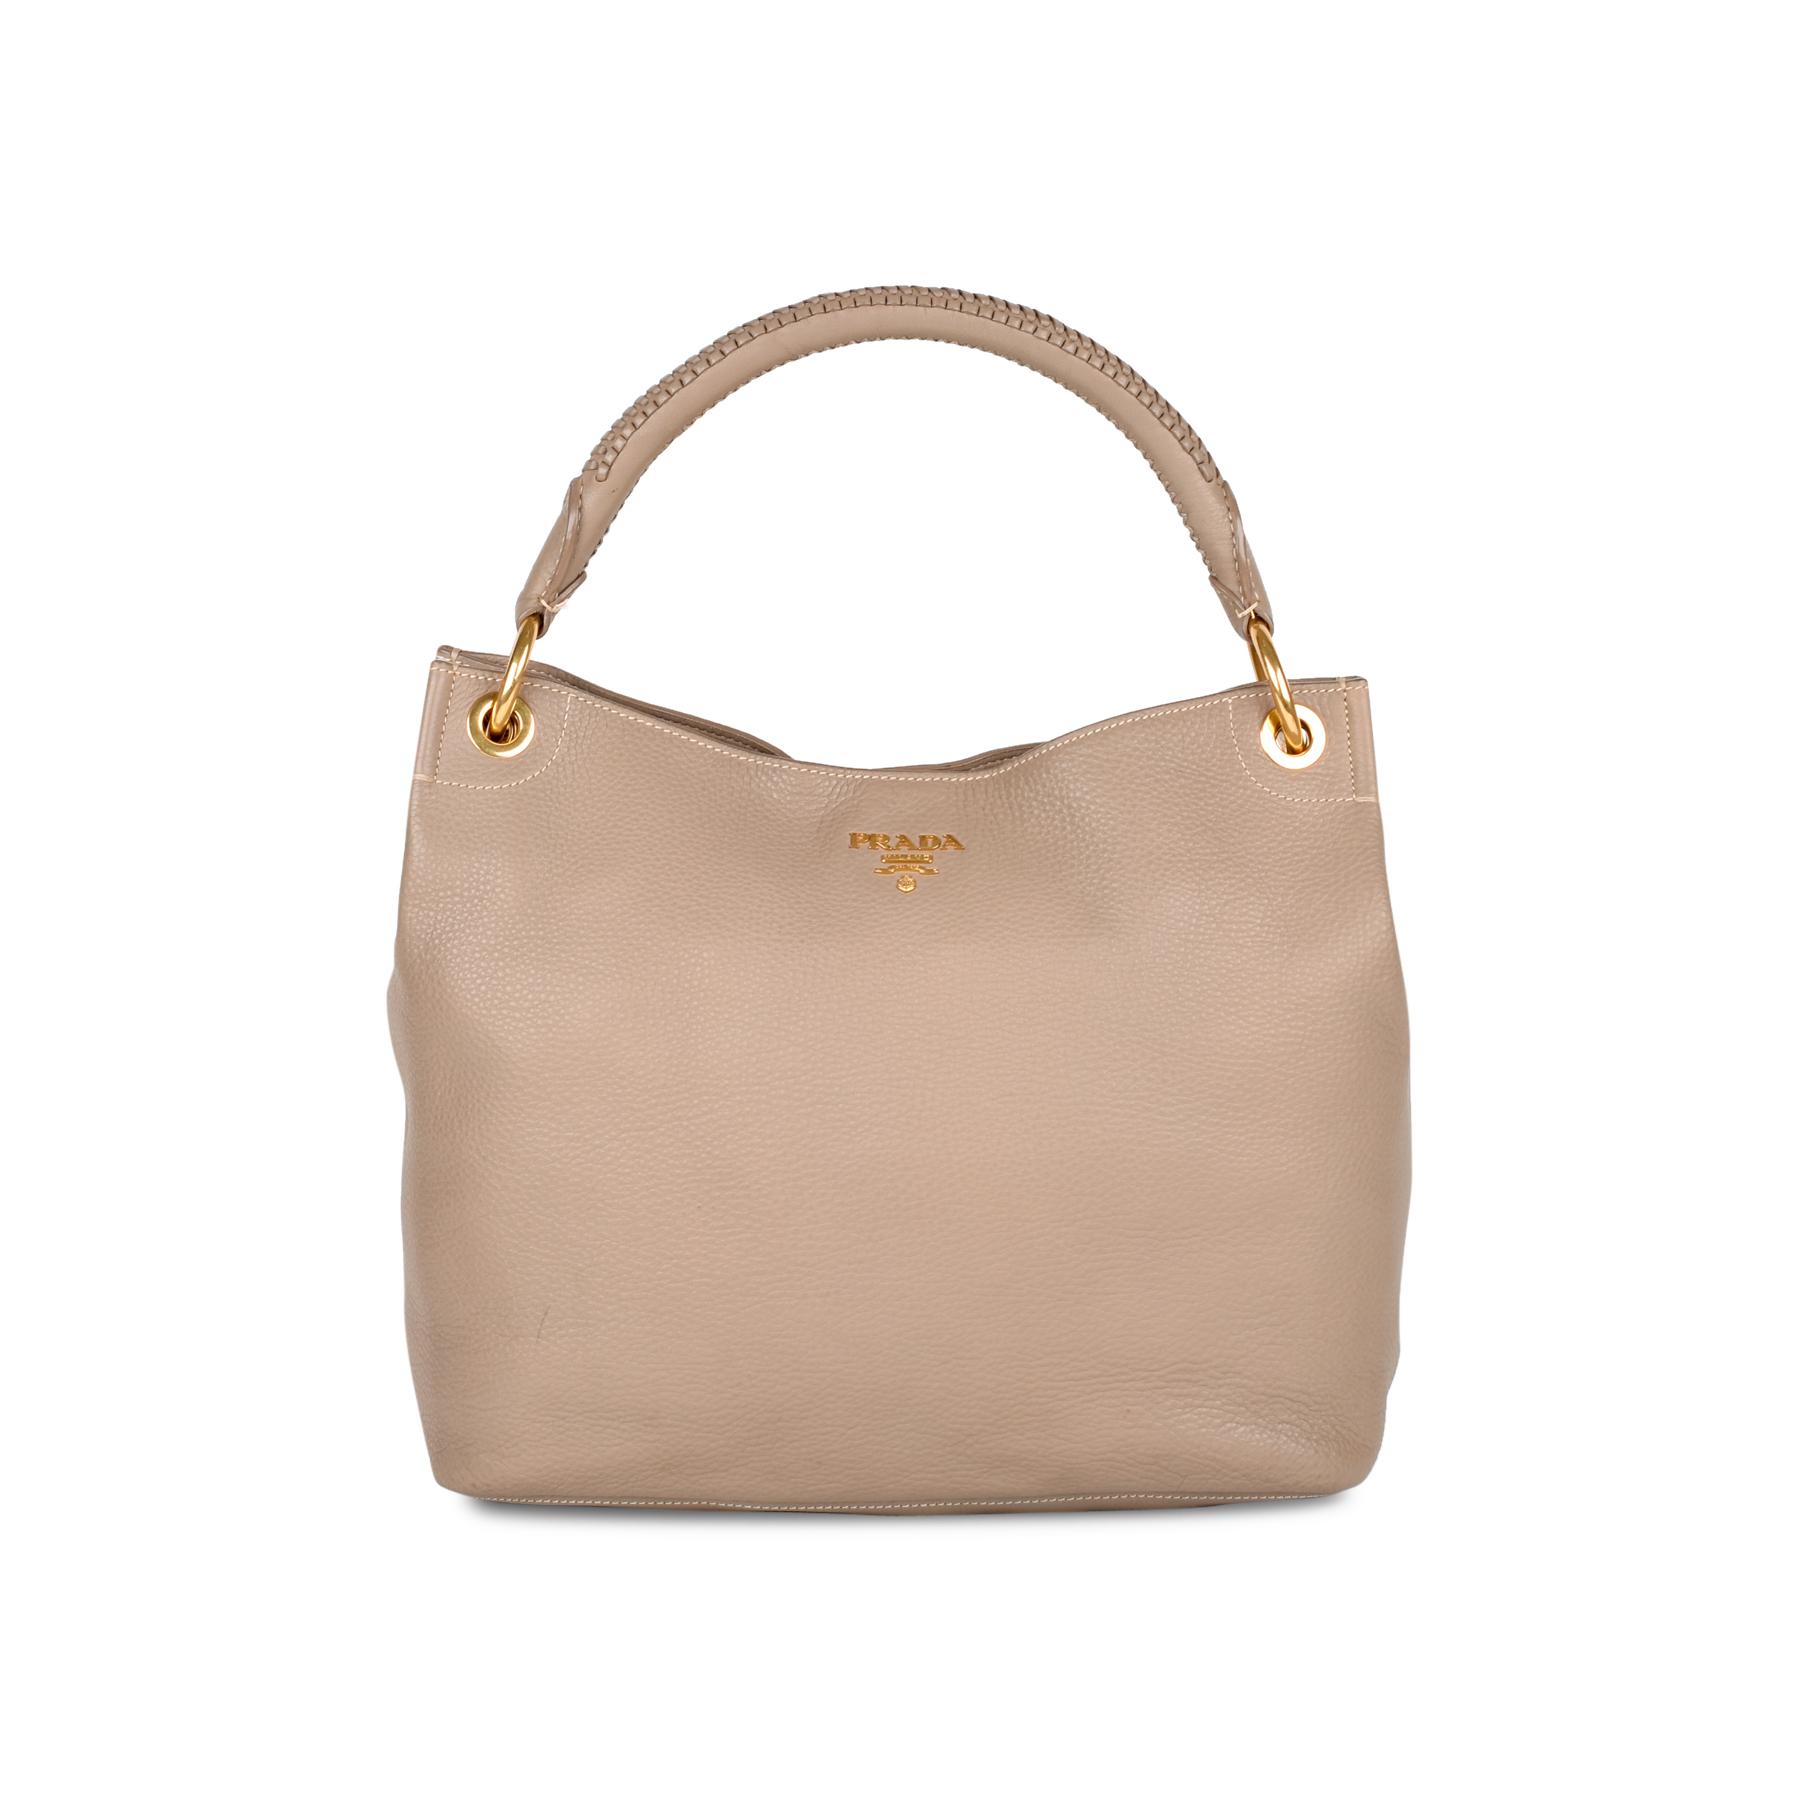 0a29a06fa4c4 Authentic Second Hand Prada Vitello Daino Hobo Bag (PSS-434-00003)   THE  FIFTH COLLECTION